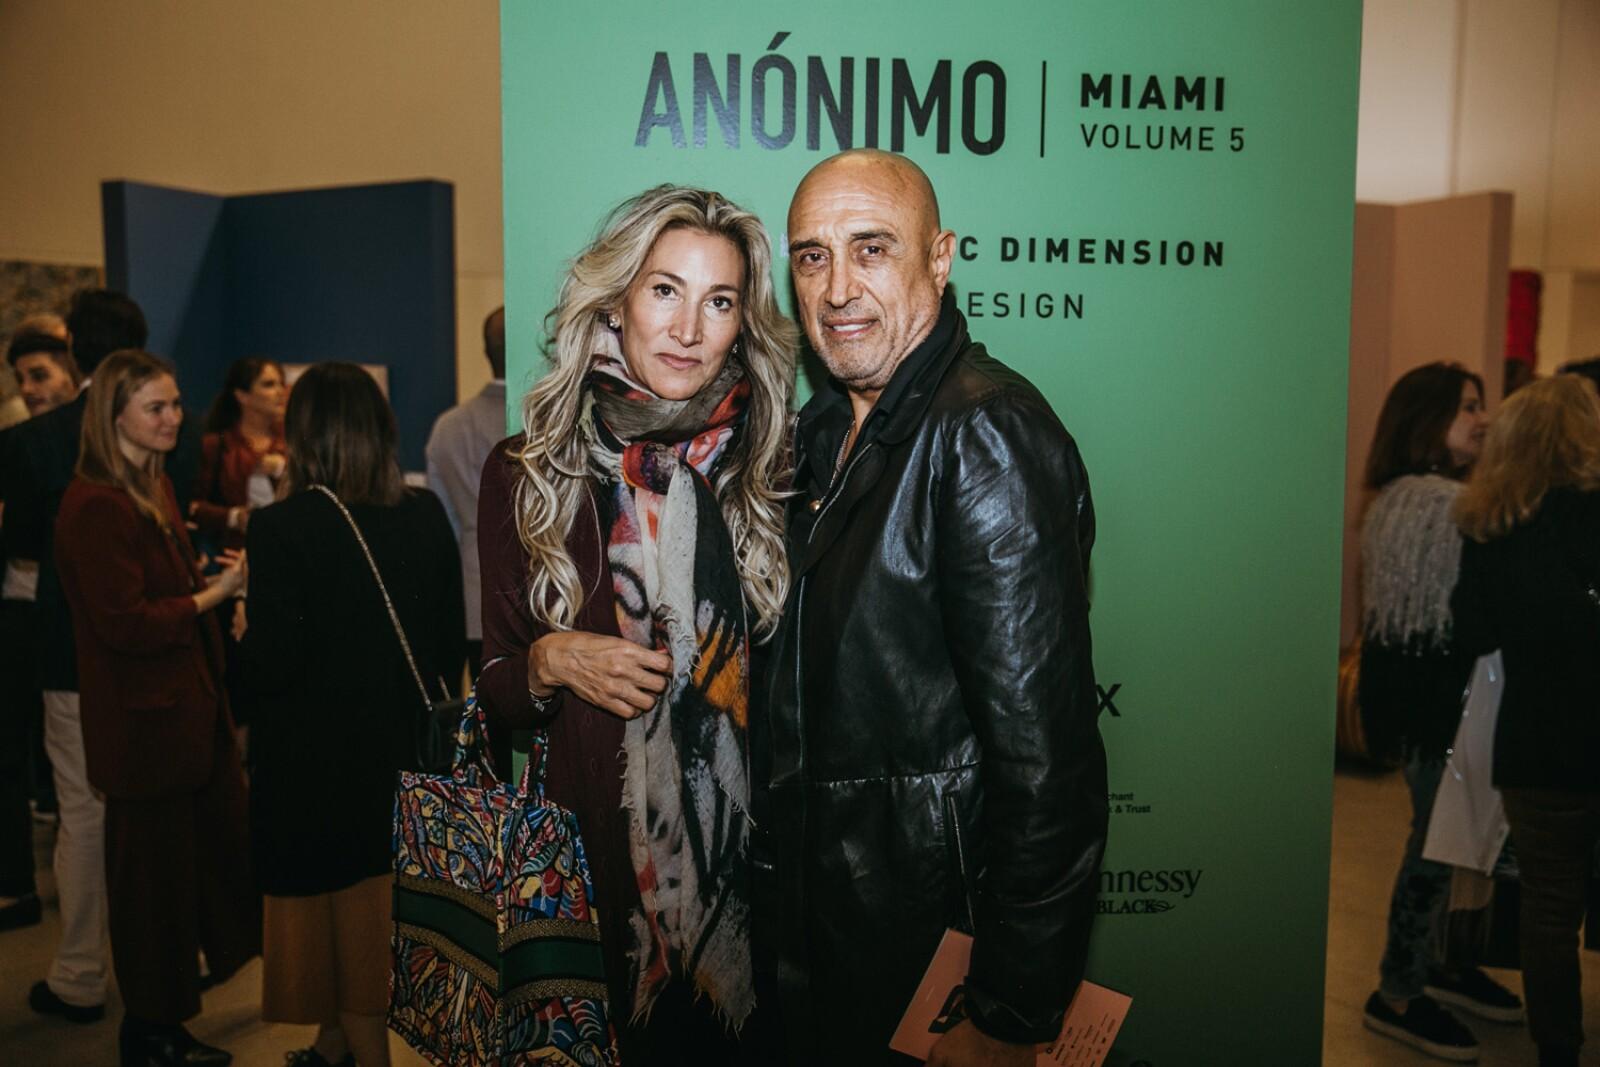 Anónimo Miami 2018 Social 11.jpg